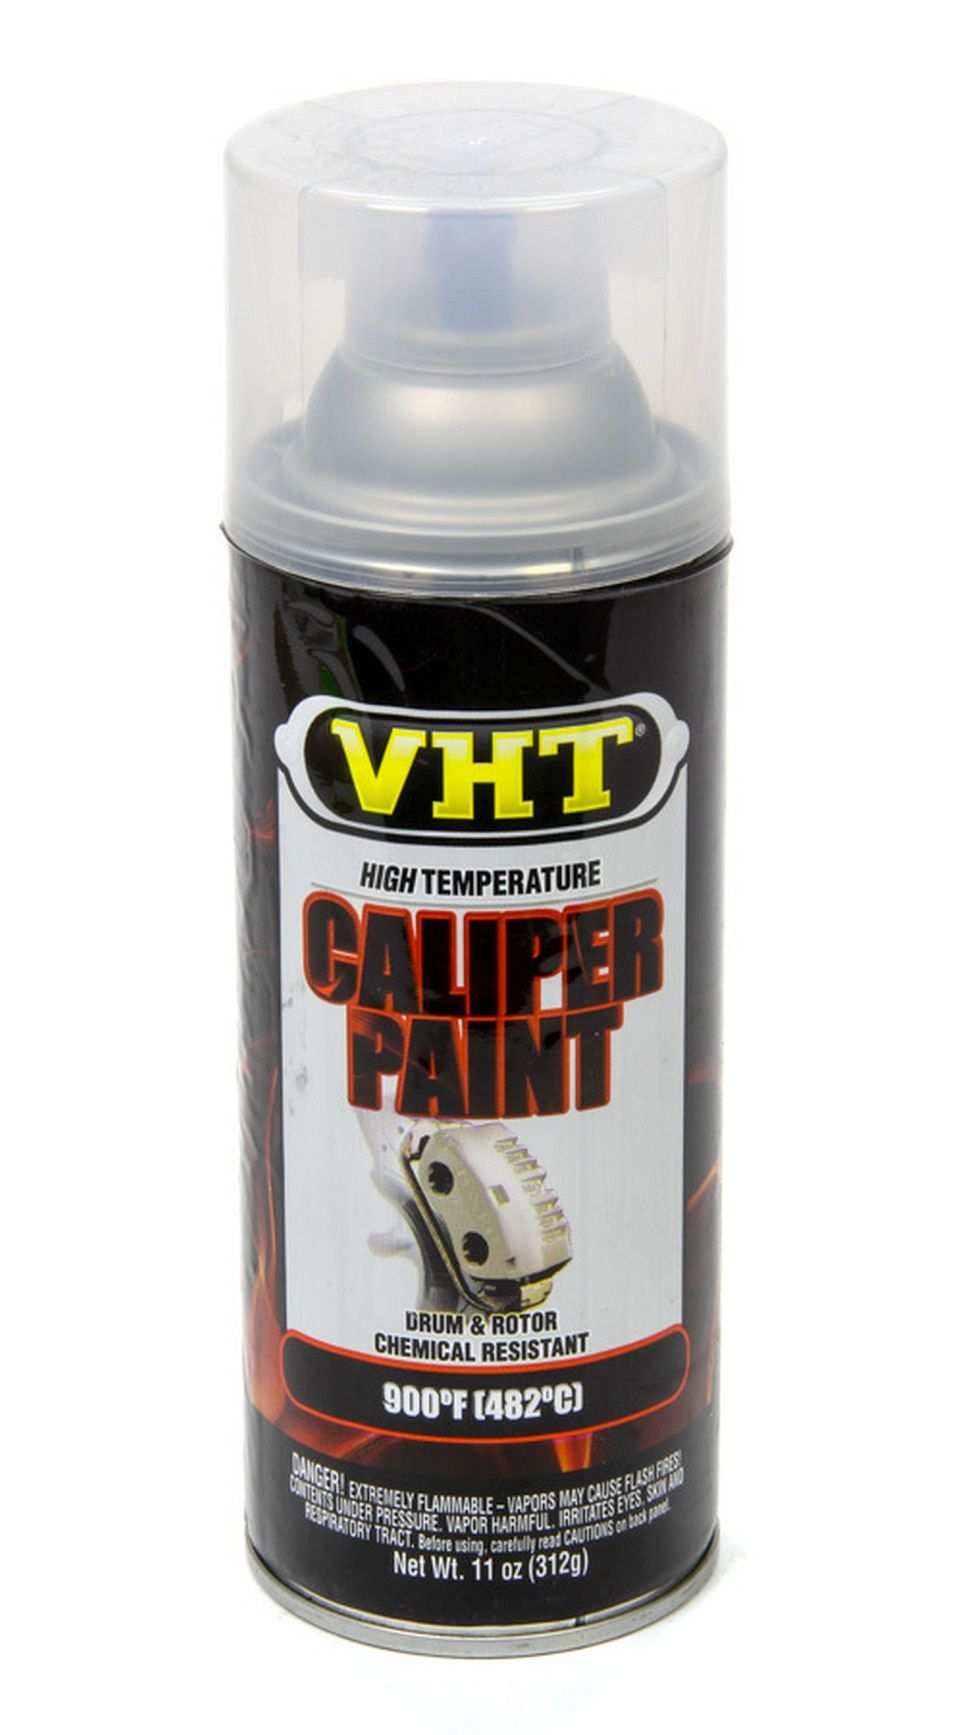 Tinta Spray Para Freio Verniz Brilhante 482°C - VHT  - PRO-1 Serious Performance